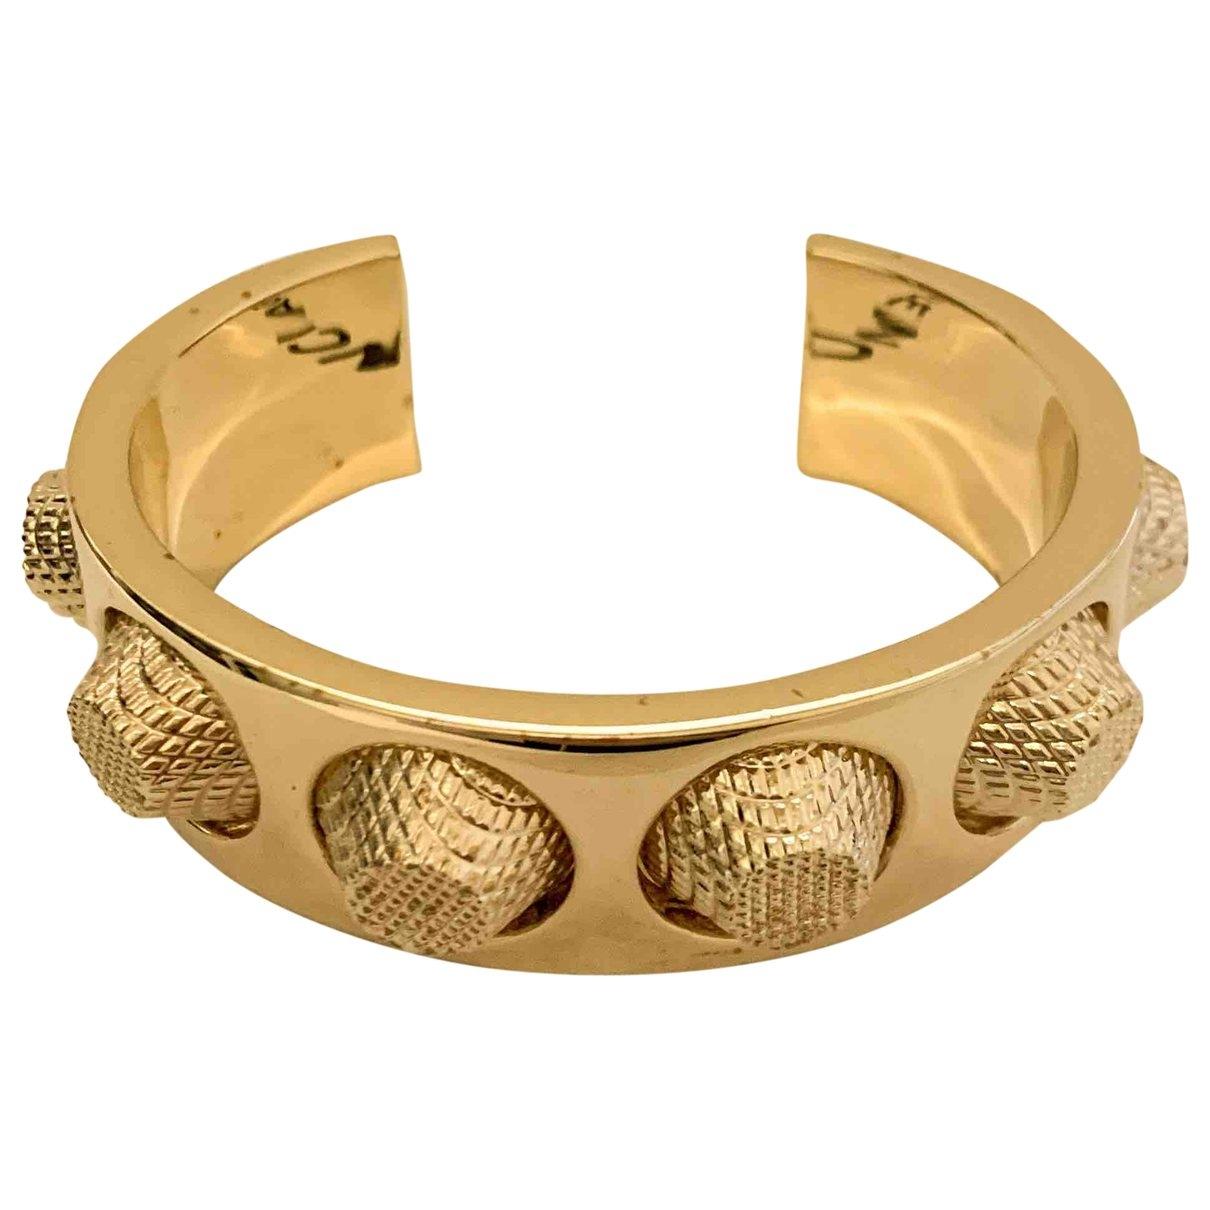 Balenciaga \N Gold Metal bracelet for Women \N